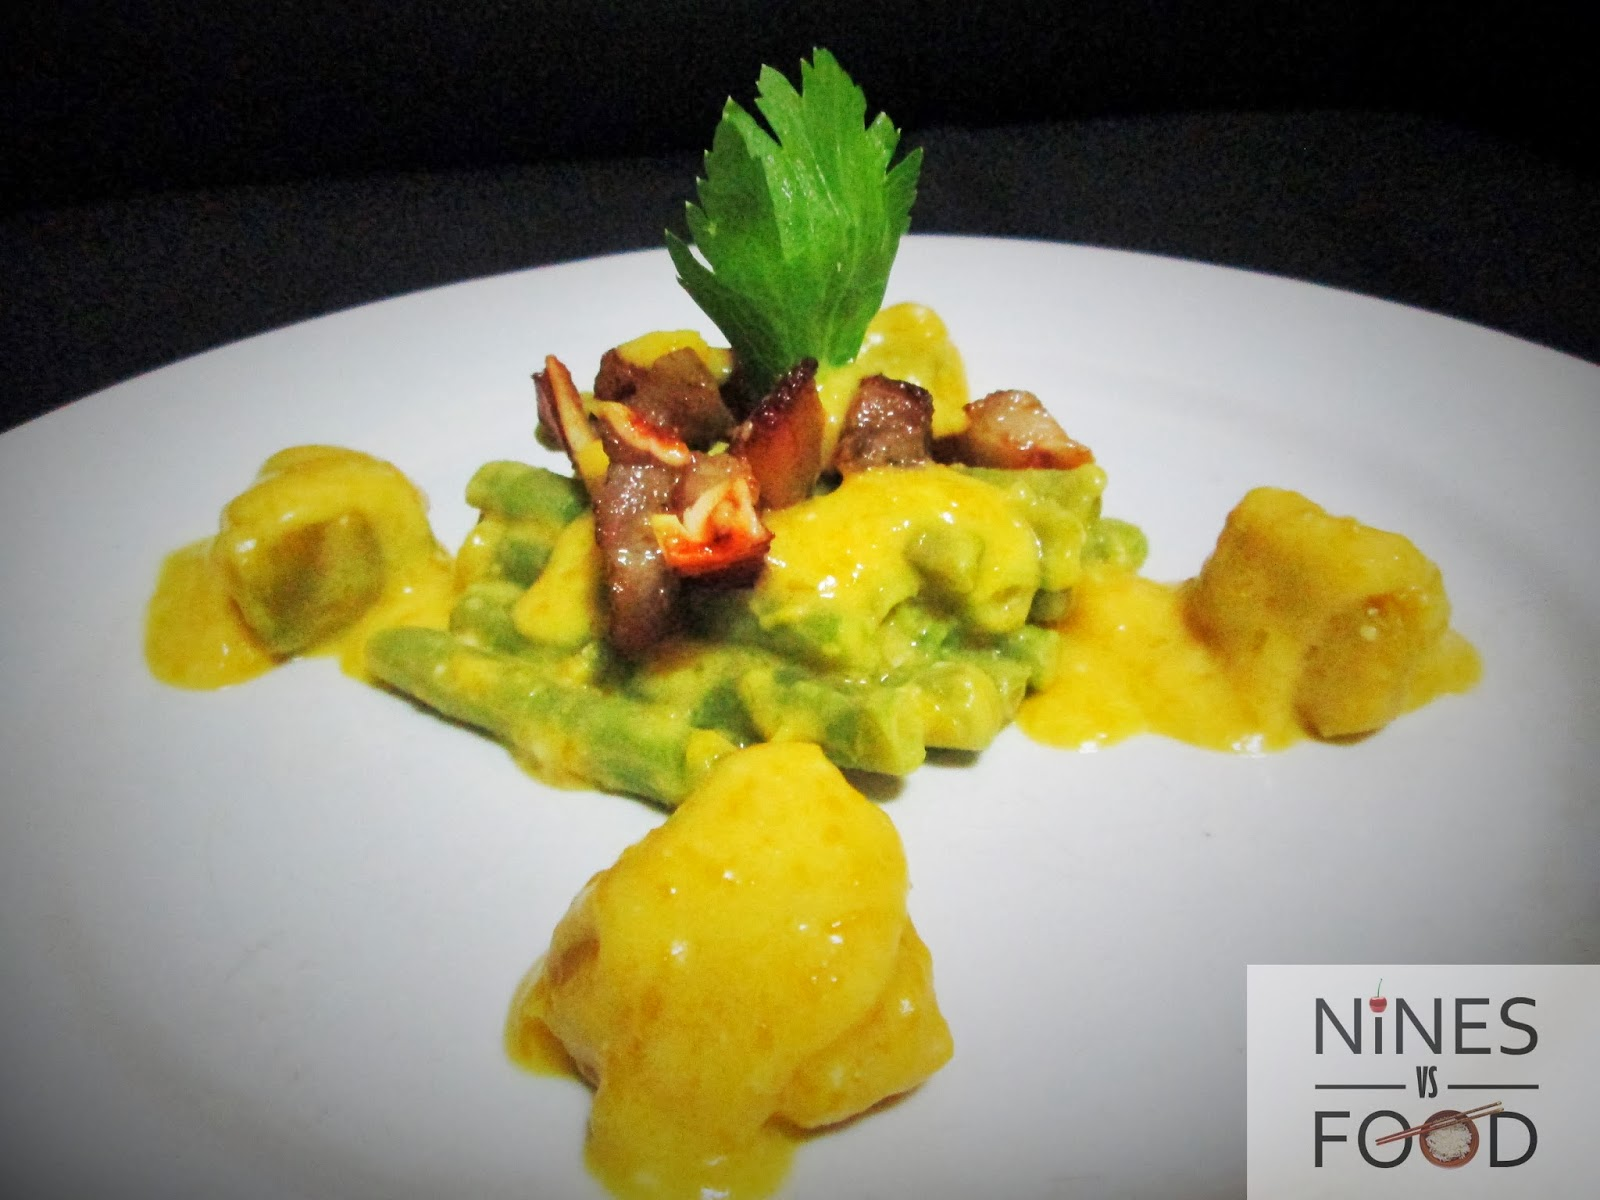 Nines vs. Food - How To Make Ginataang Gulay with Pig Ears-11.jpg